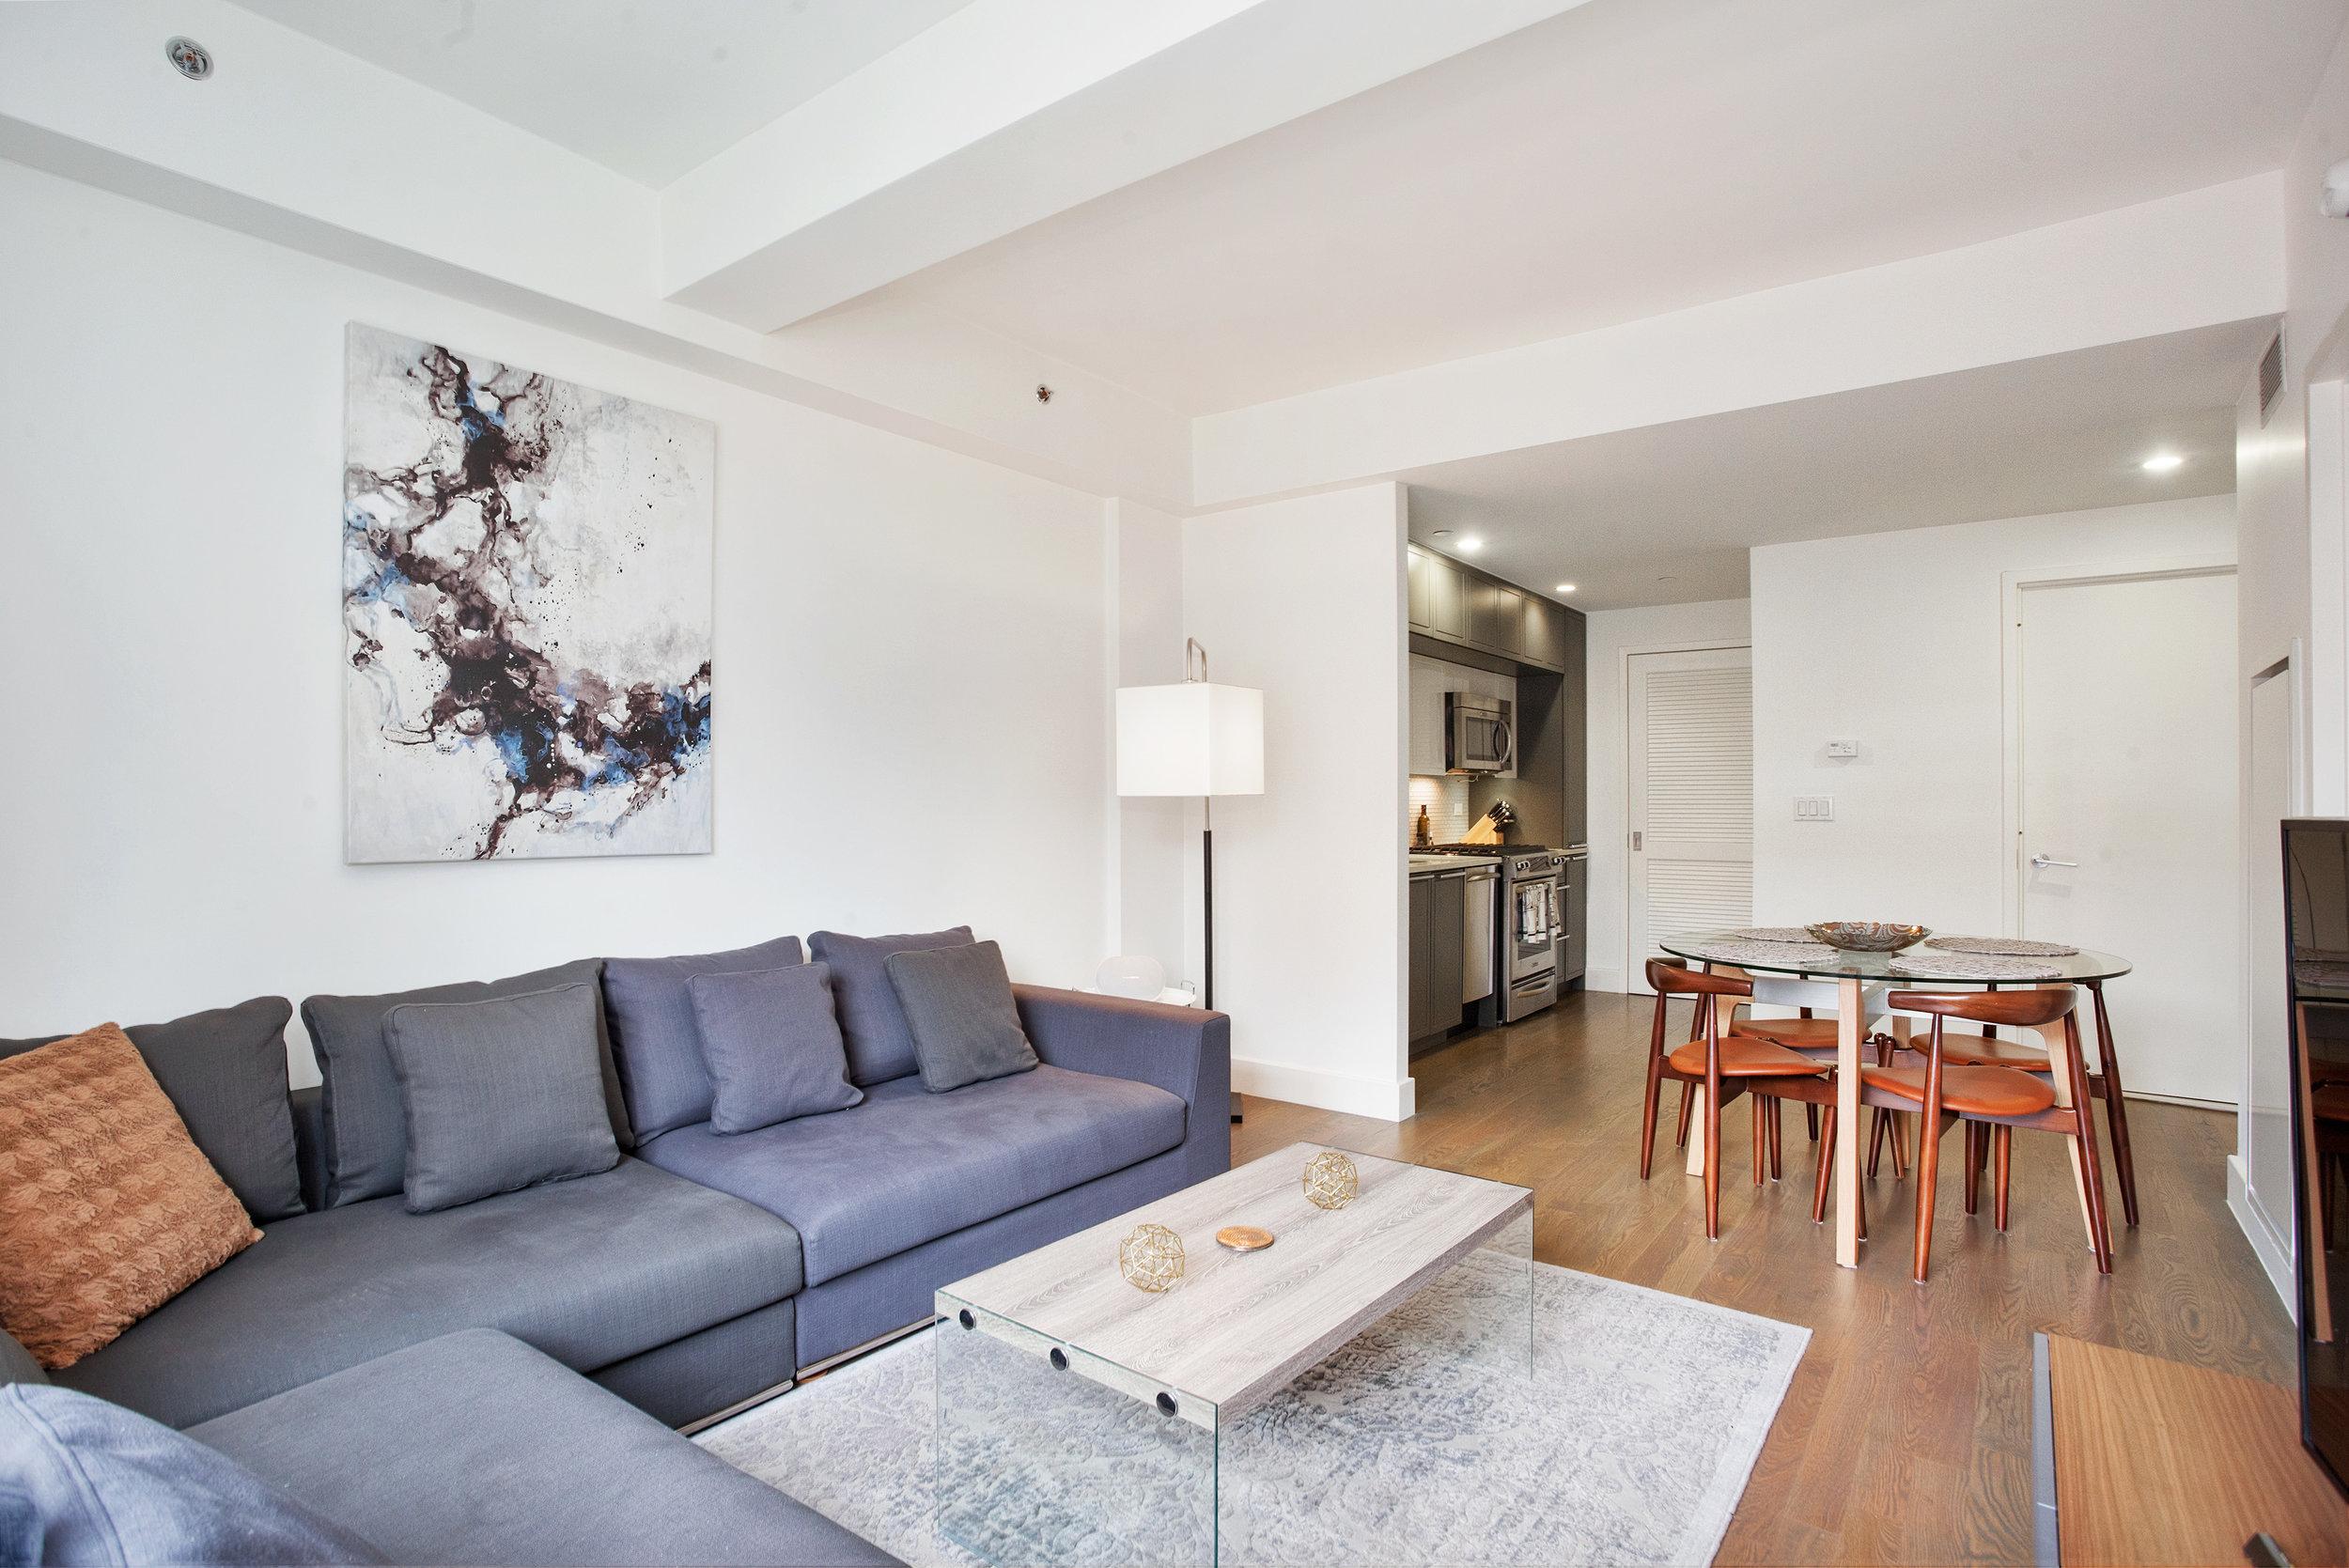 432 West 52nd Street, #6F - $1,080,000